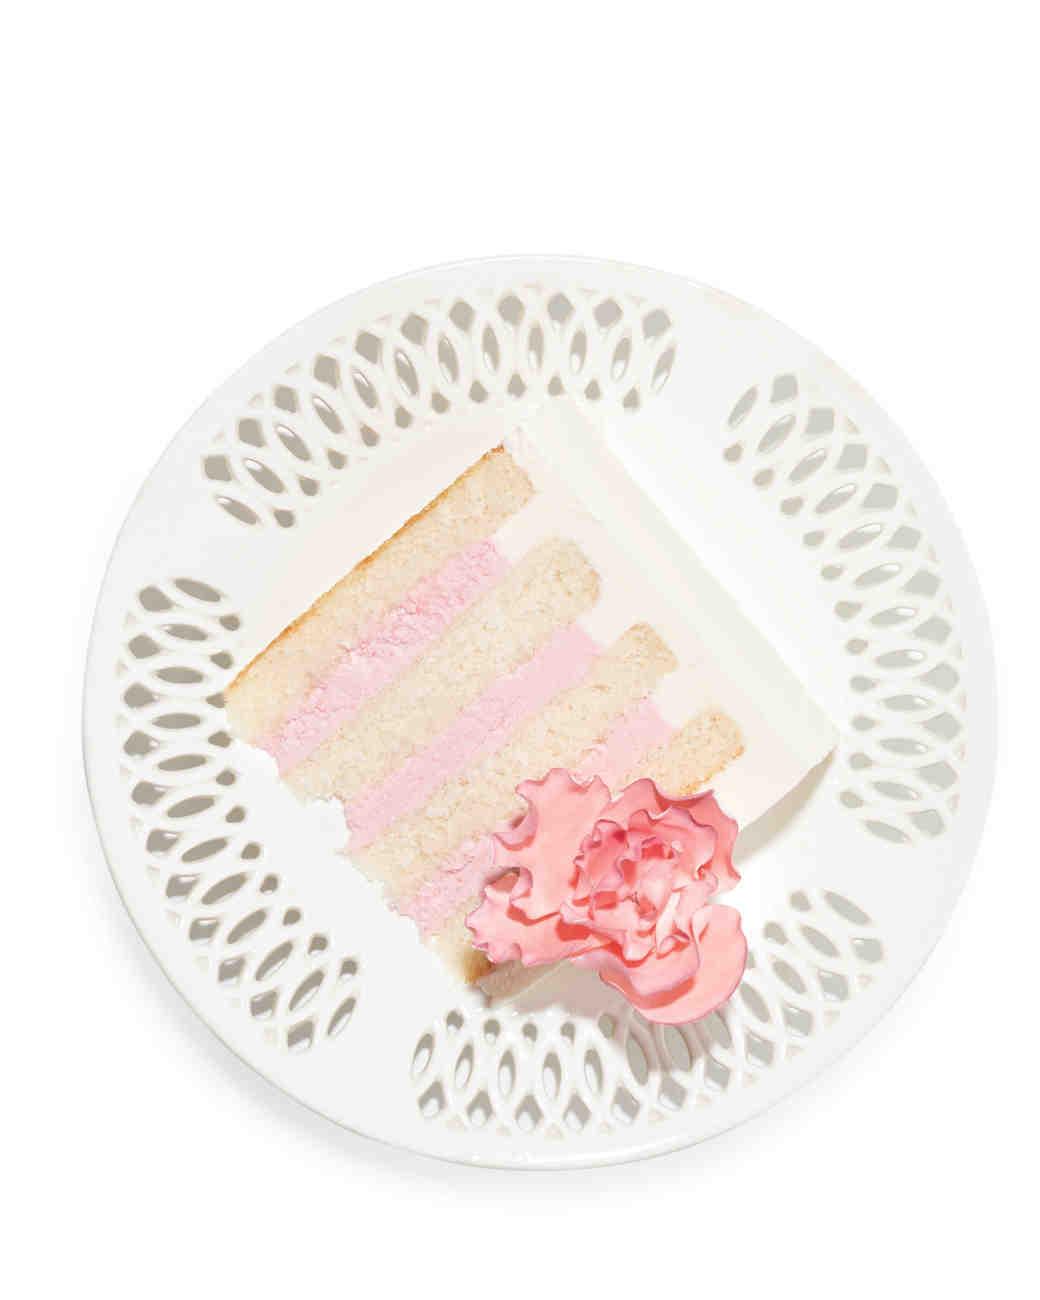 cake-slice-121-mwd110687.jpg